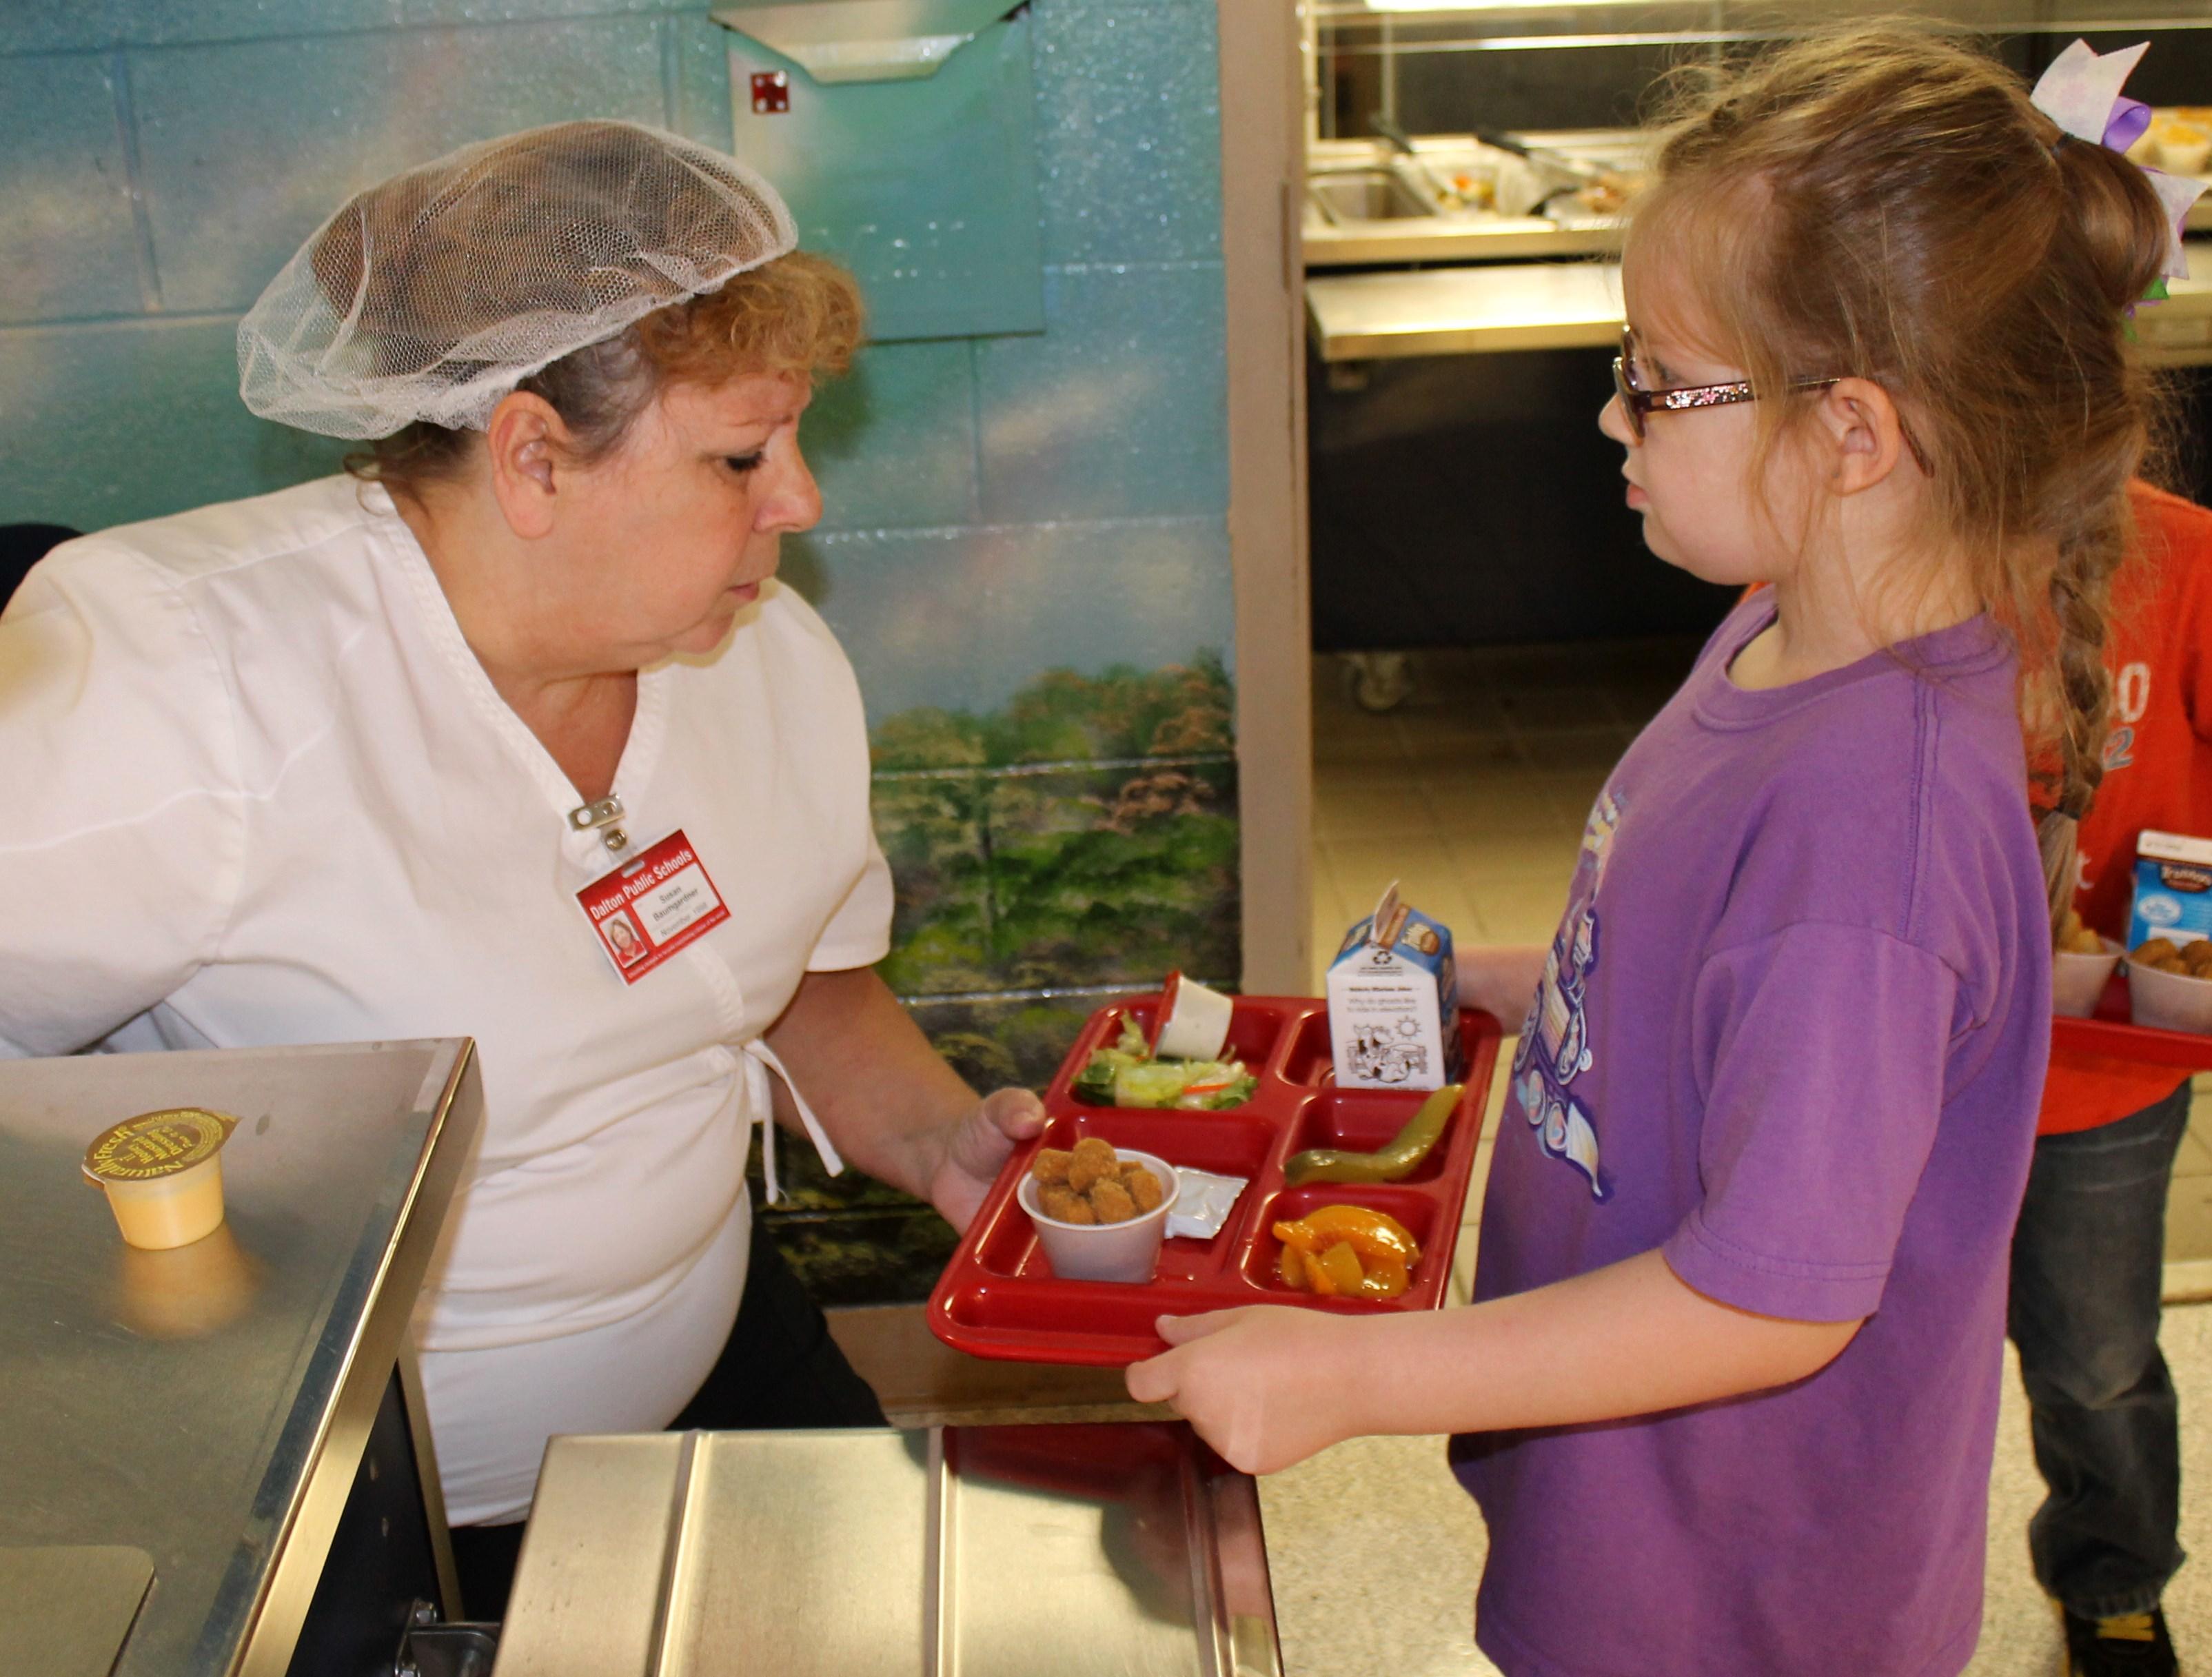 national school cafeteria workers week | just b.CAUSE